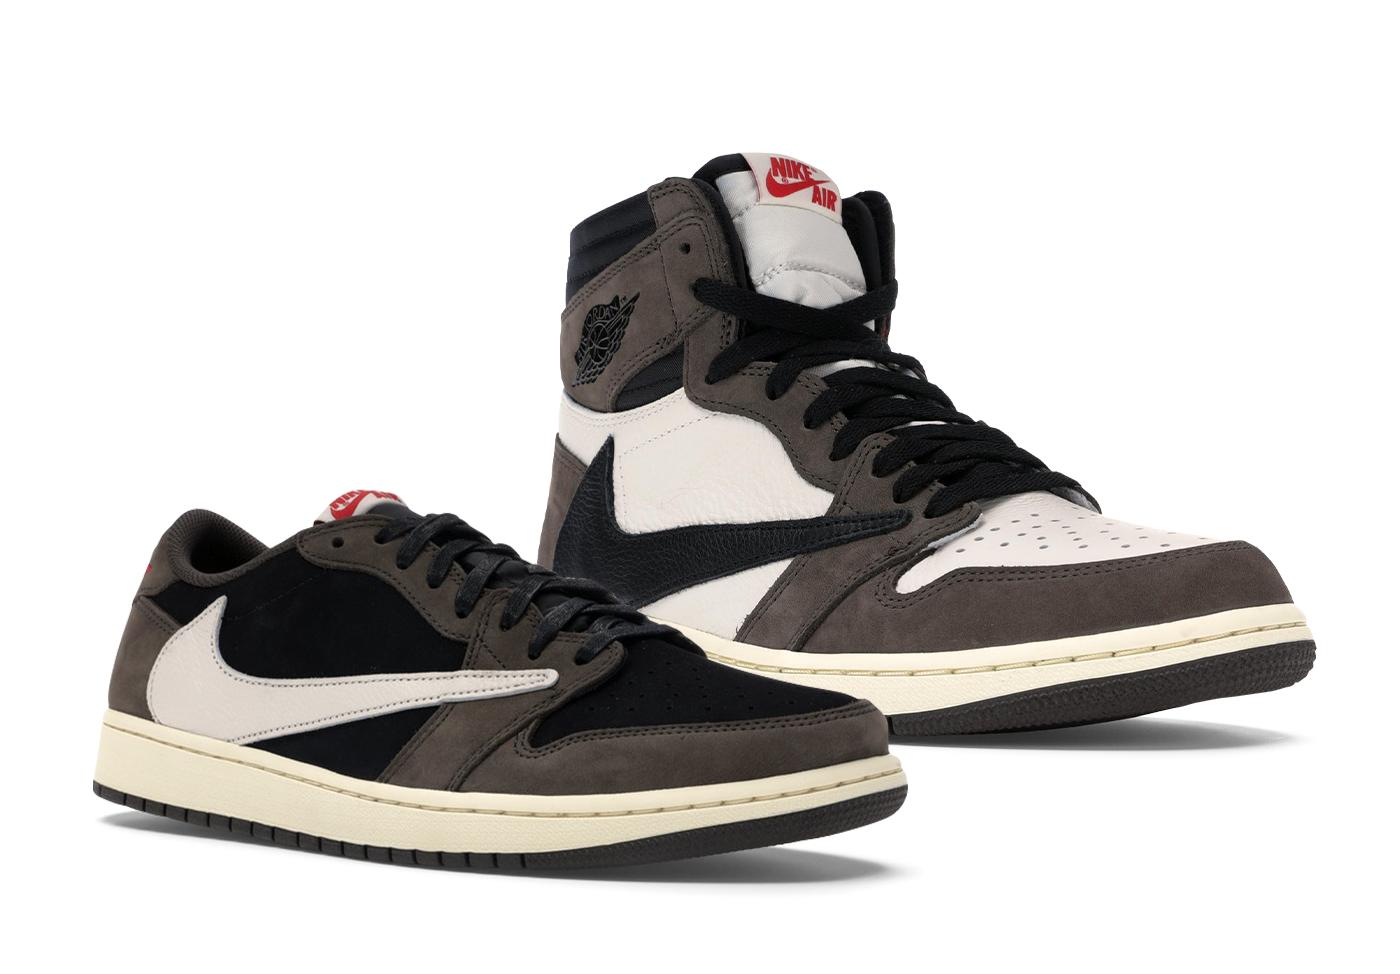 Travis Scott AJ1 Pack ReStockX - Sneakers